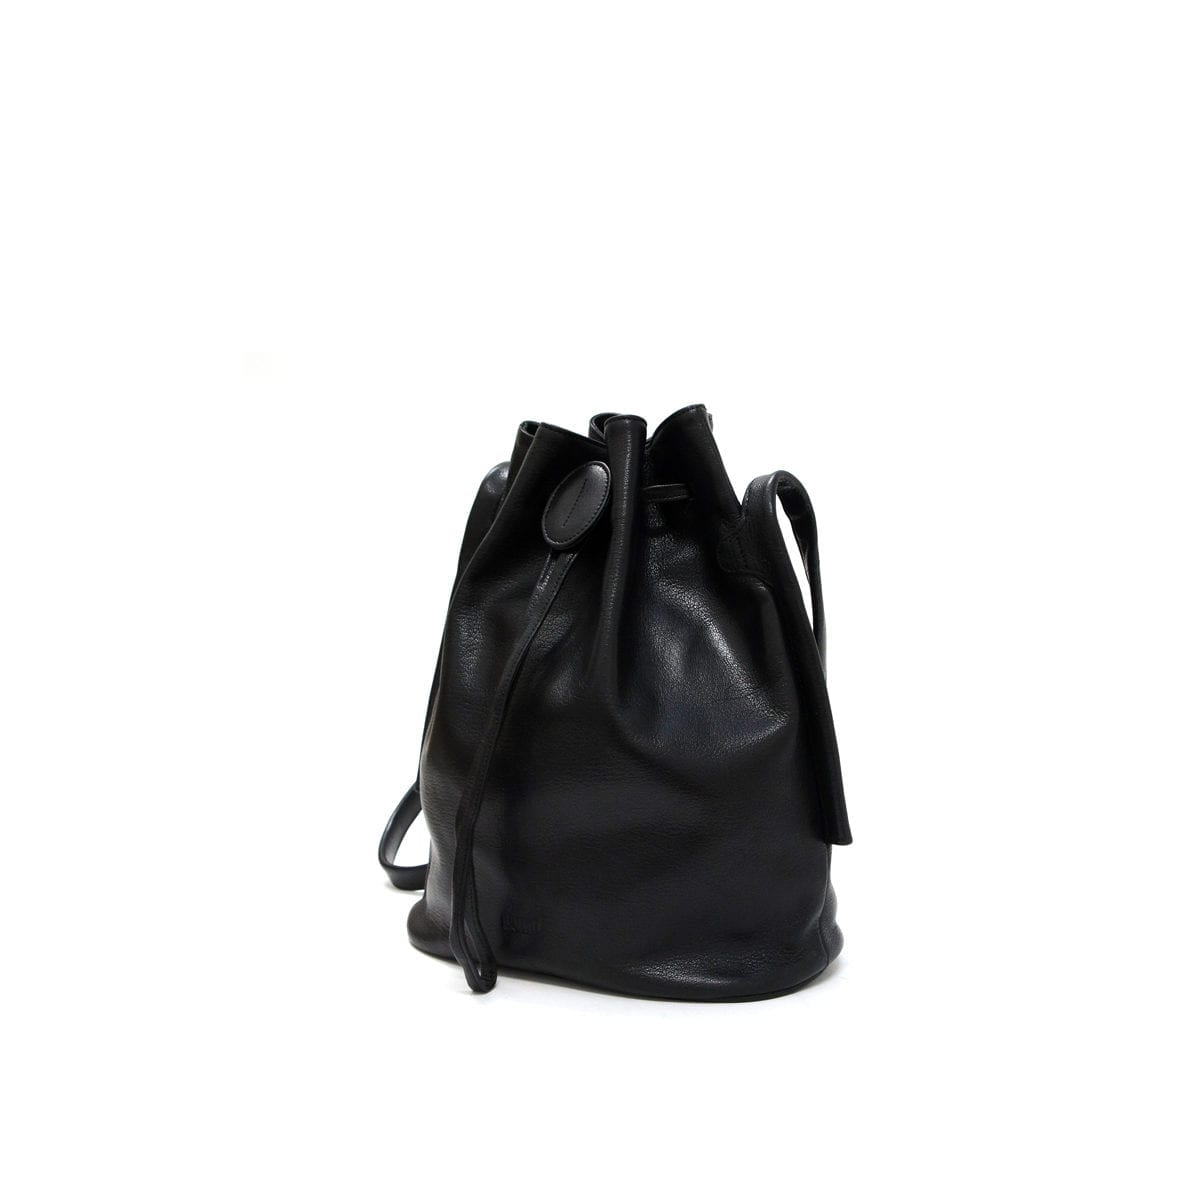 Lumi Verna Large Bucket Bag Black